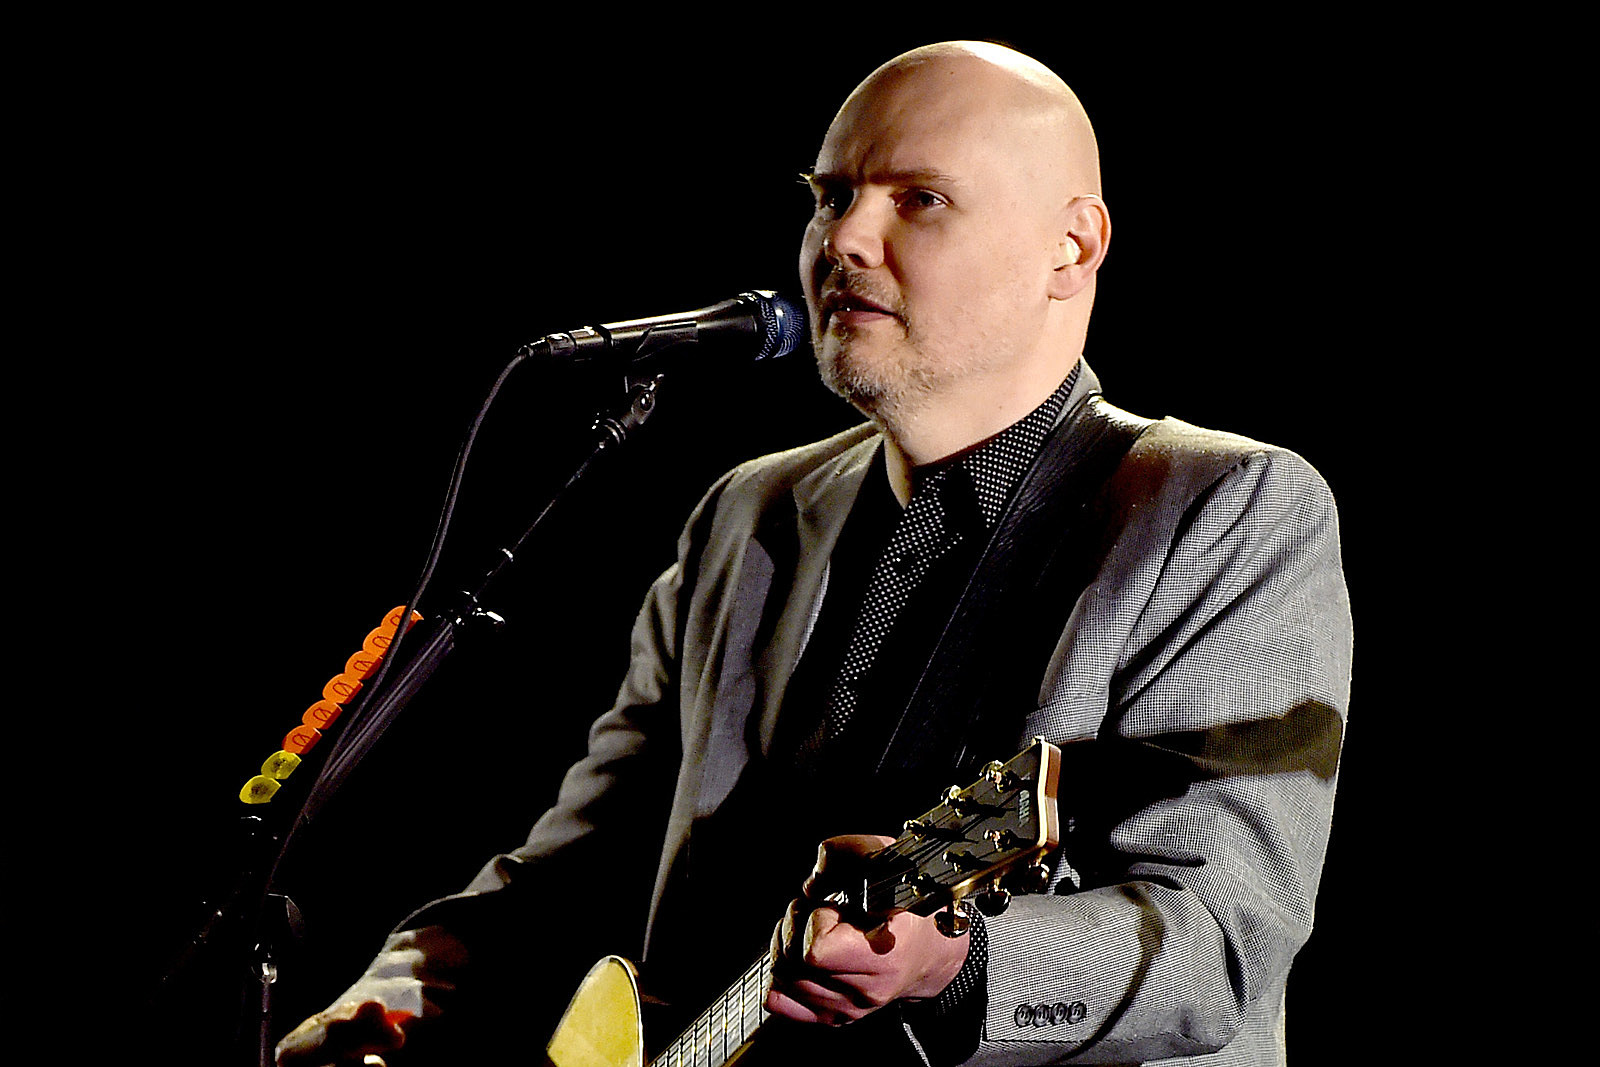 Billy Corgan Teases Smashing Pumpkins Reunion